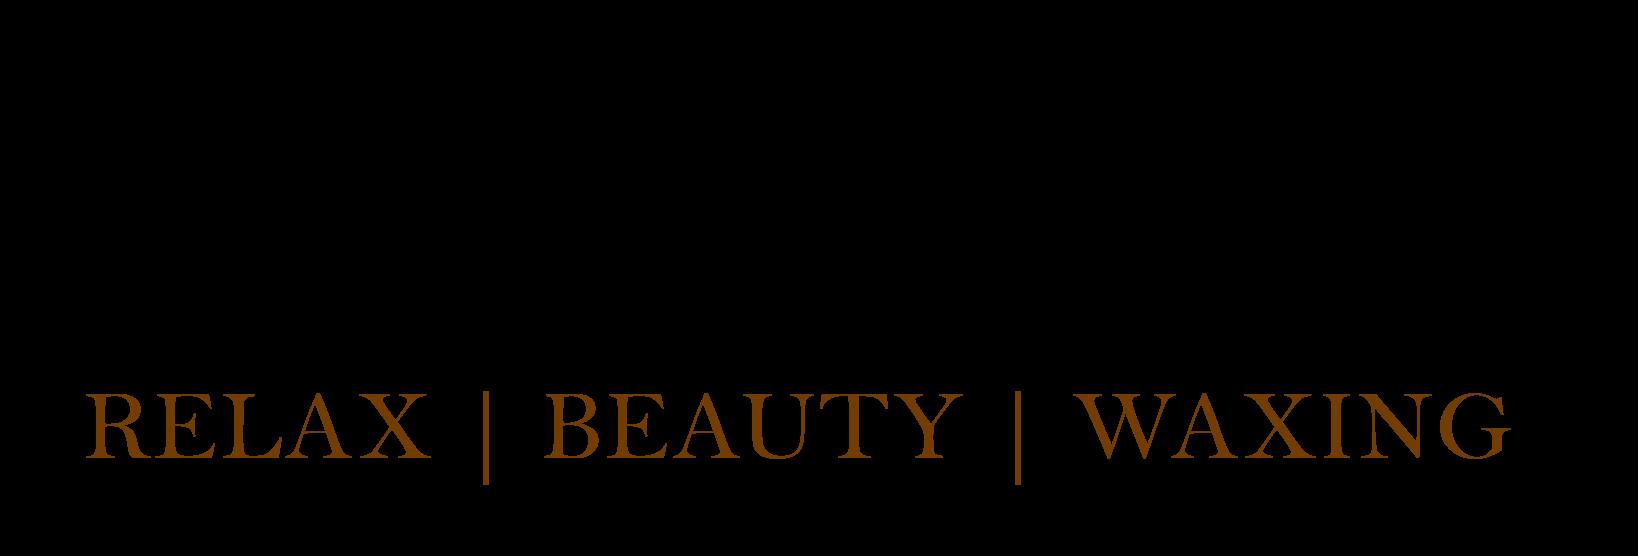 Schoonheidssalon Salon Ivon Logo